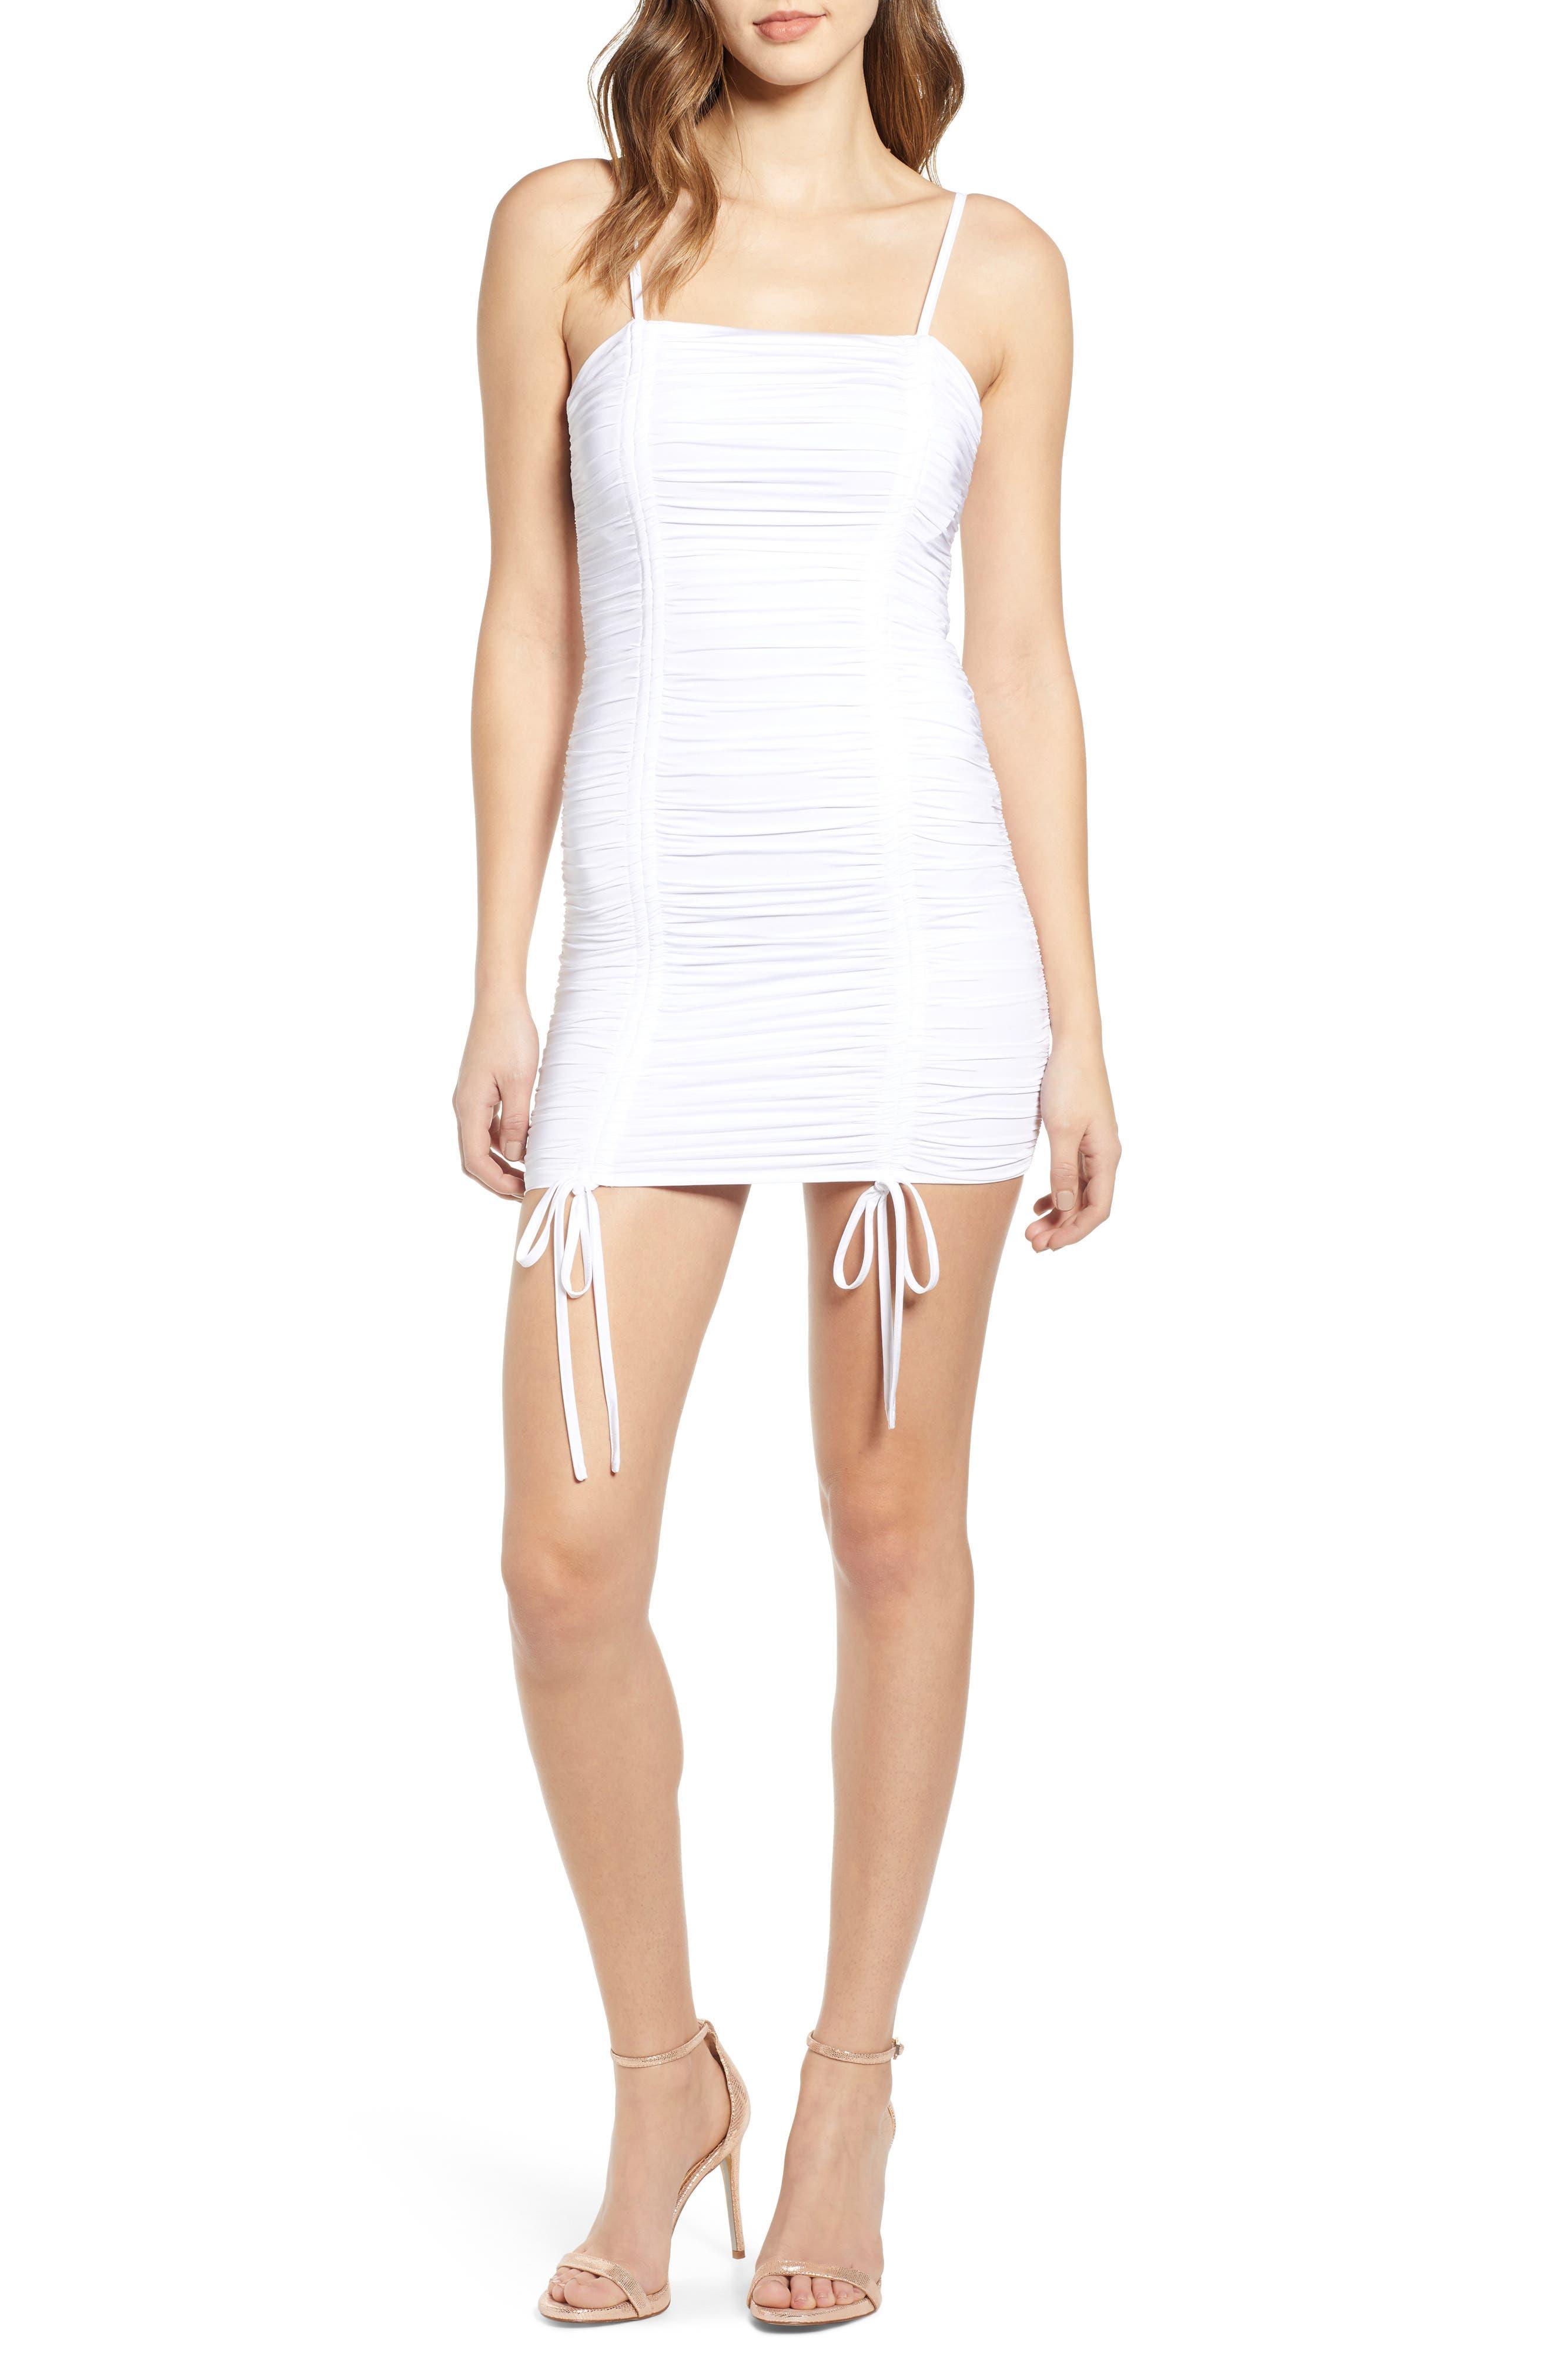 Tiger Mist Zion Ruched Mini Dress, White